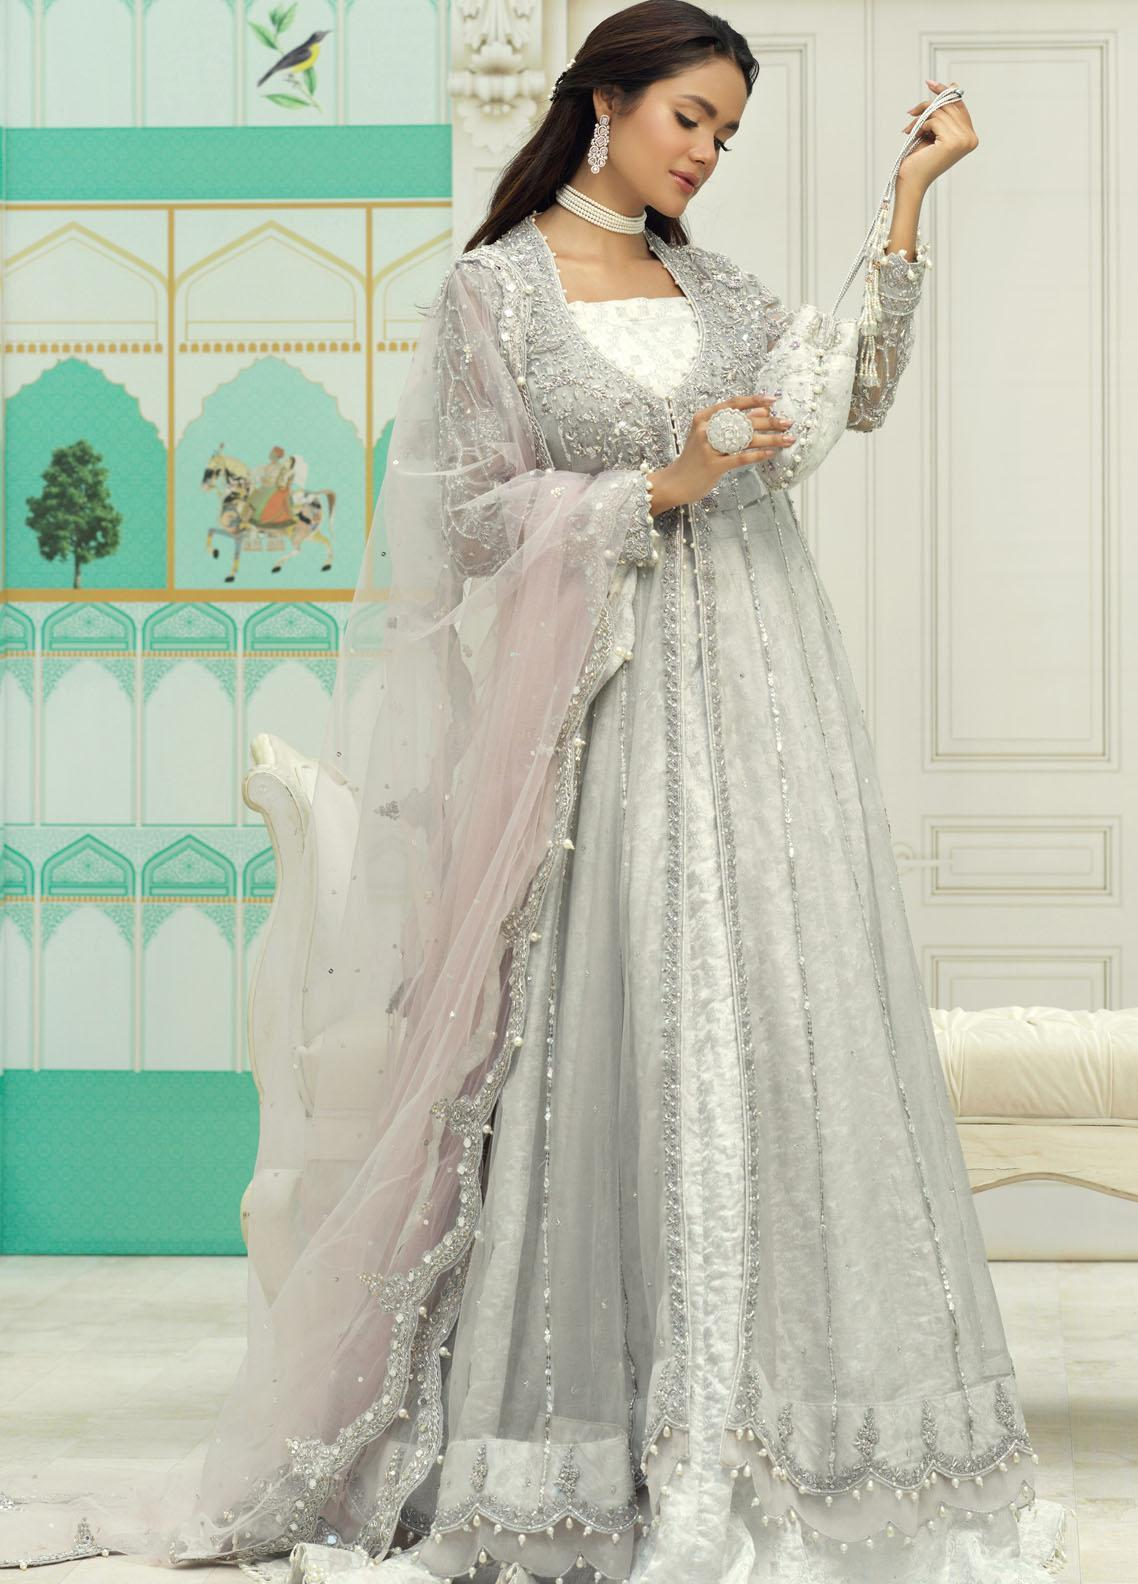 Zaaviay Luxury Pret Embroidered Net 3 Piece Dress FARA